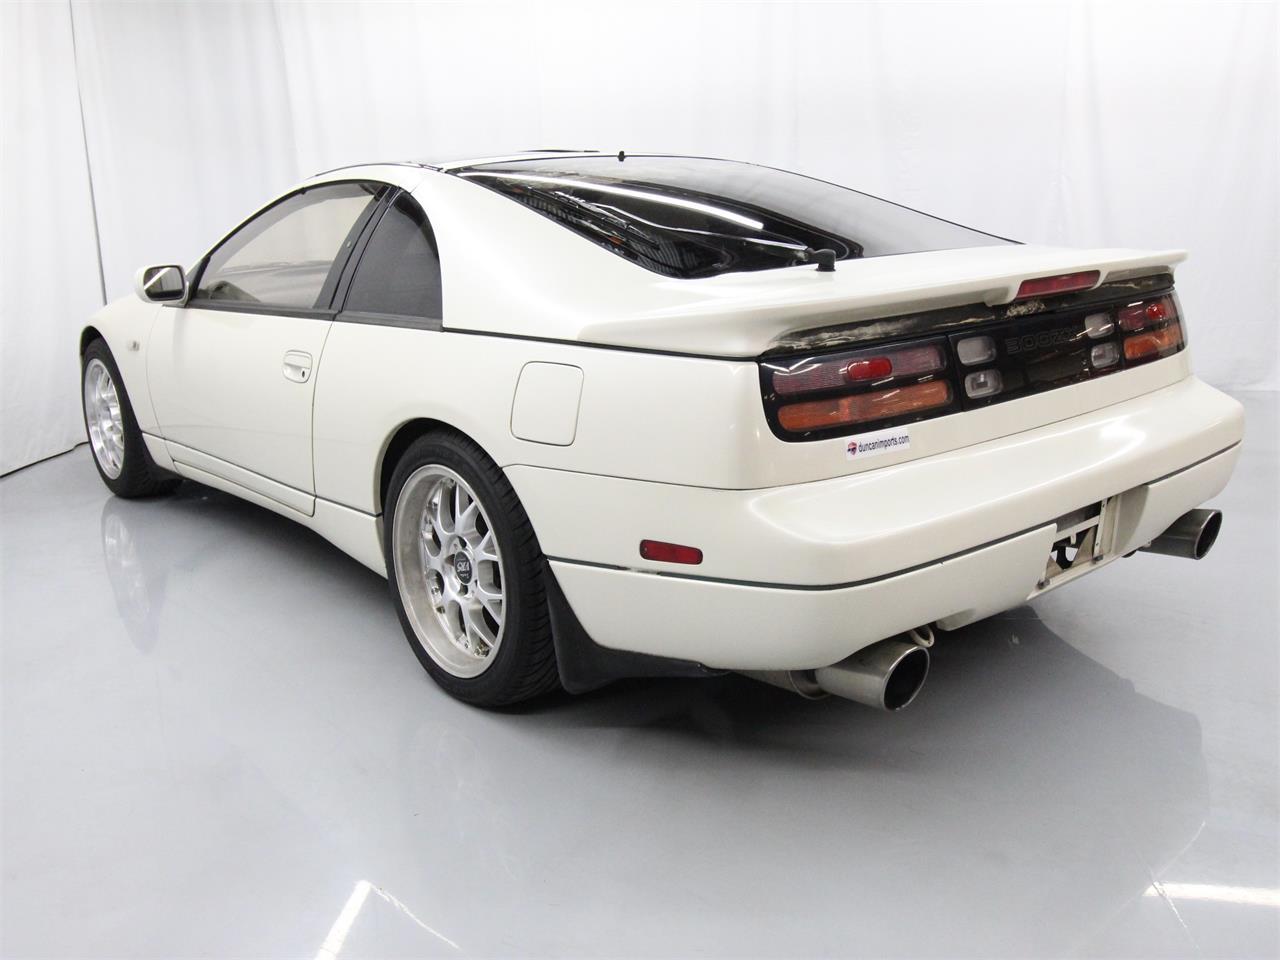 1990 Nissan Fairlady (CC-1223491) for sale in Christiansburg, Virginia